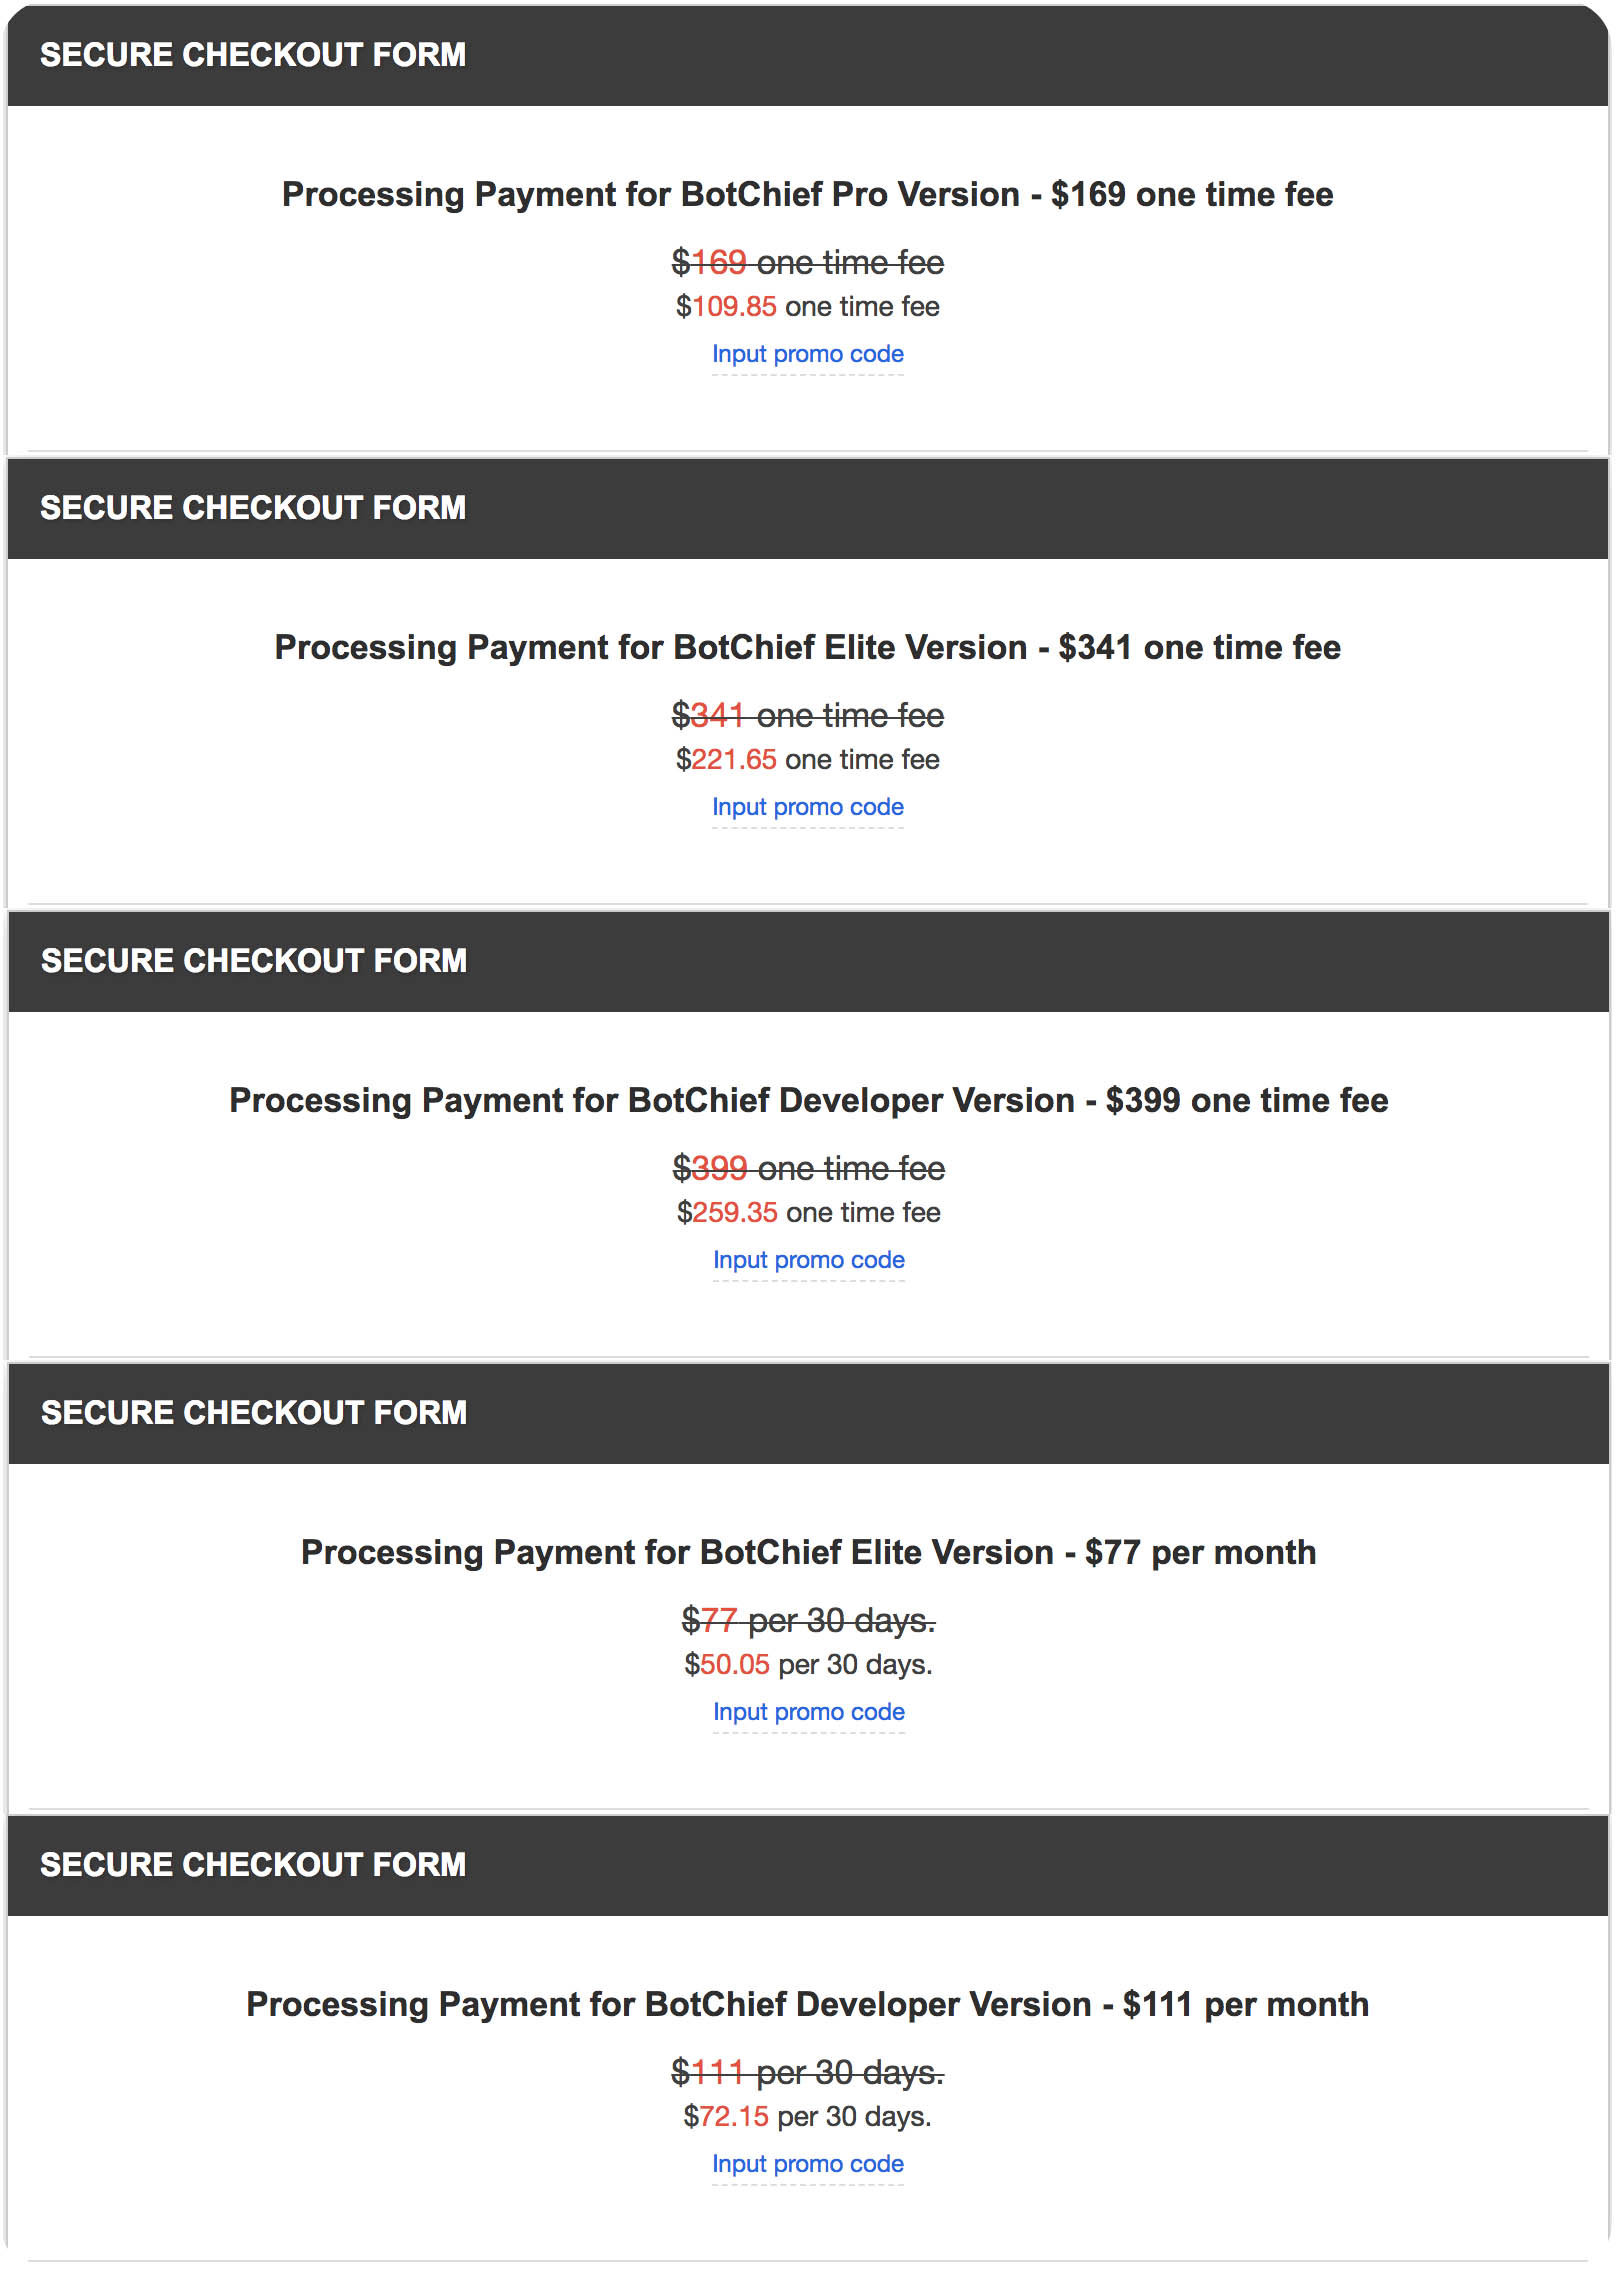 bofchief coupon code, bofchief discount code, bofchief promo code